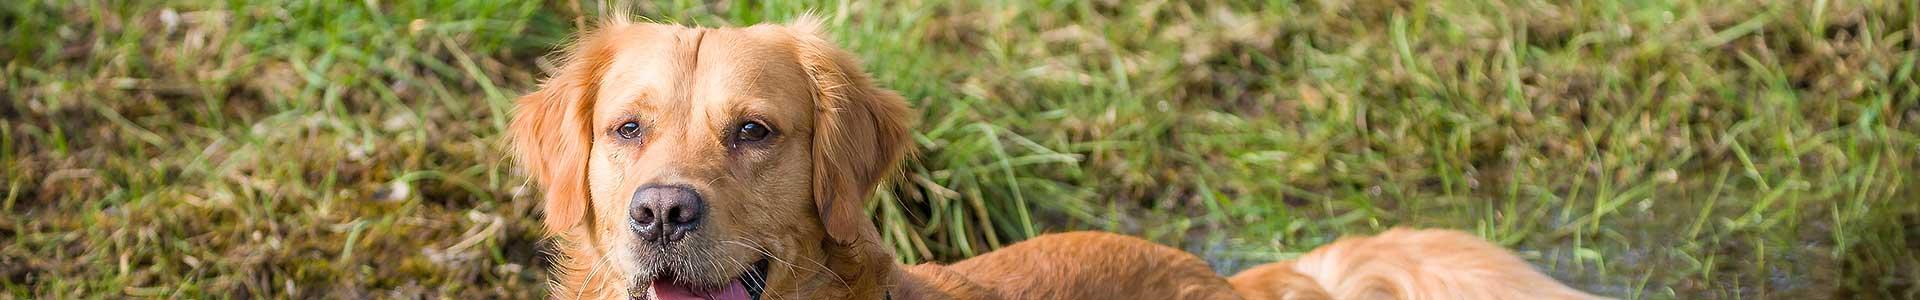 Bianka´s goldige Hunde